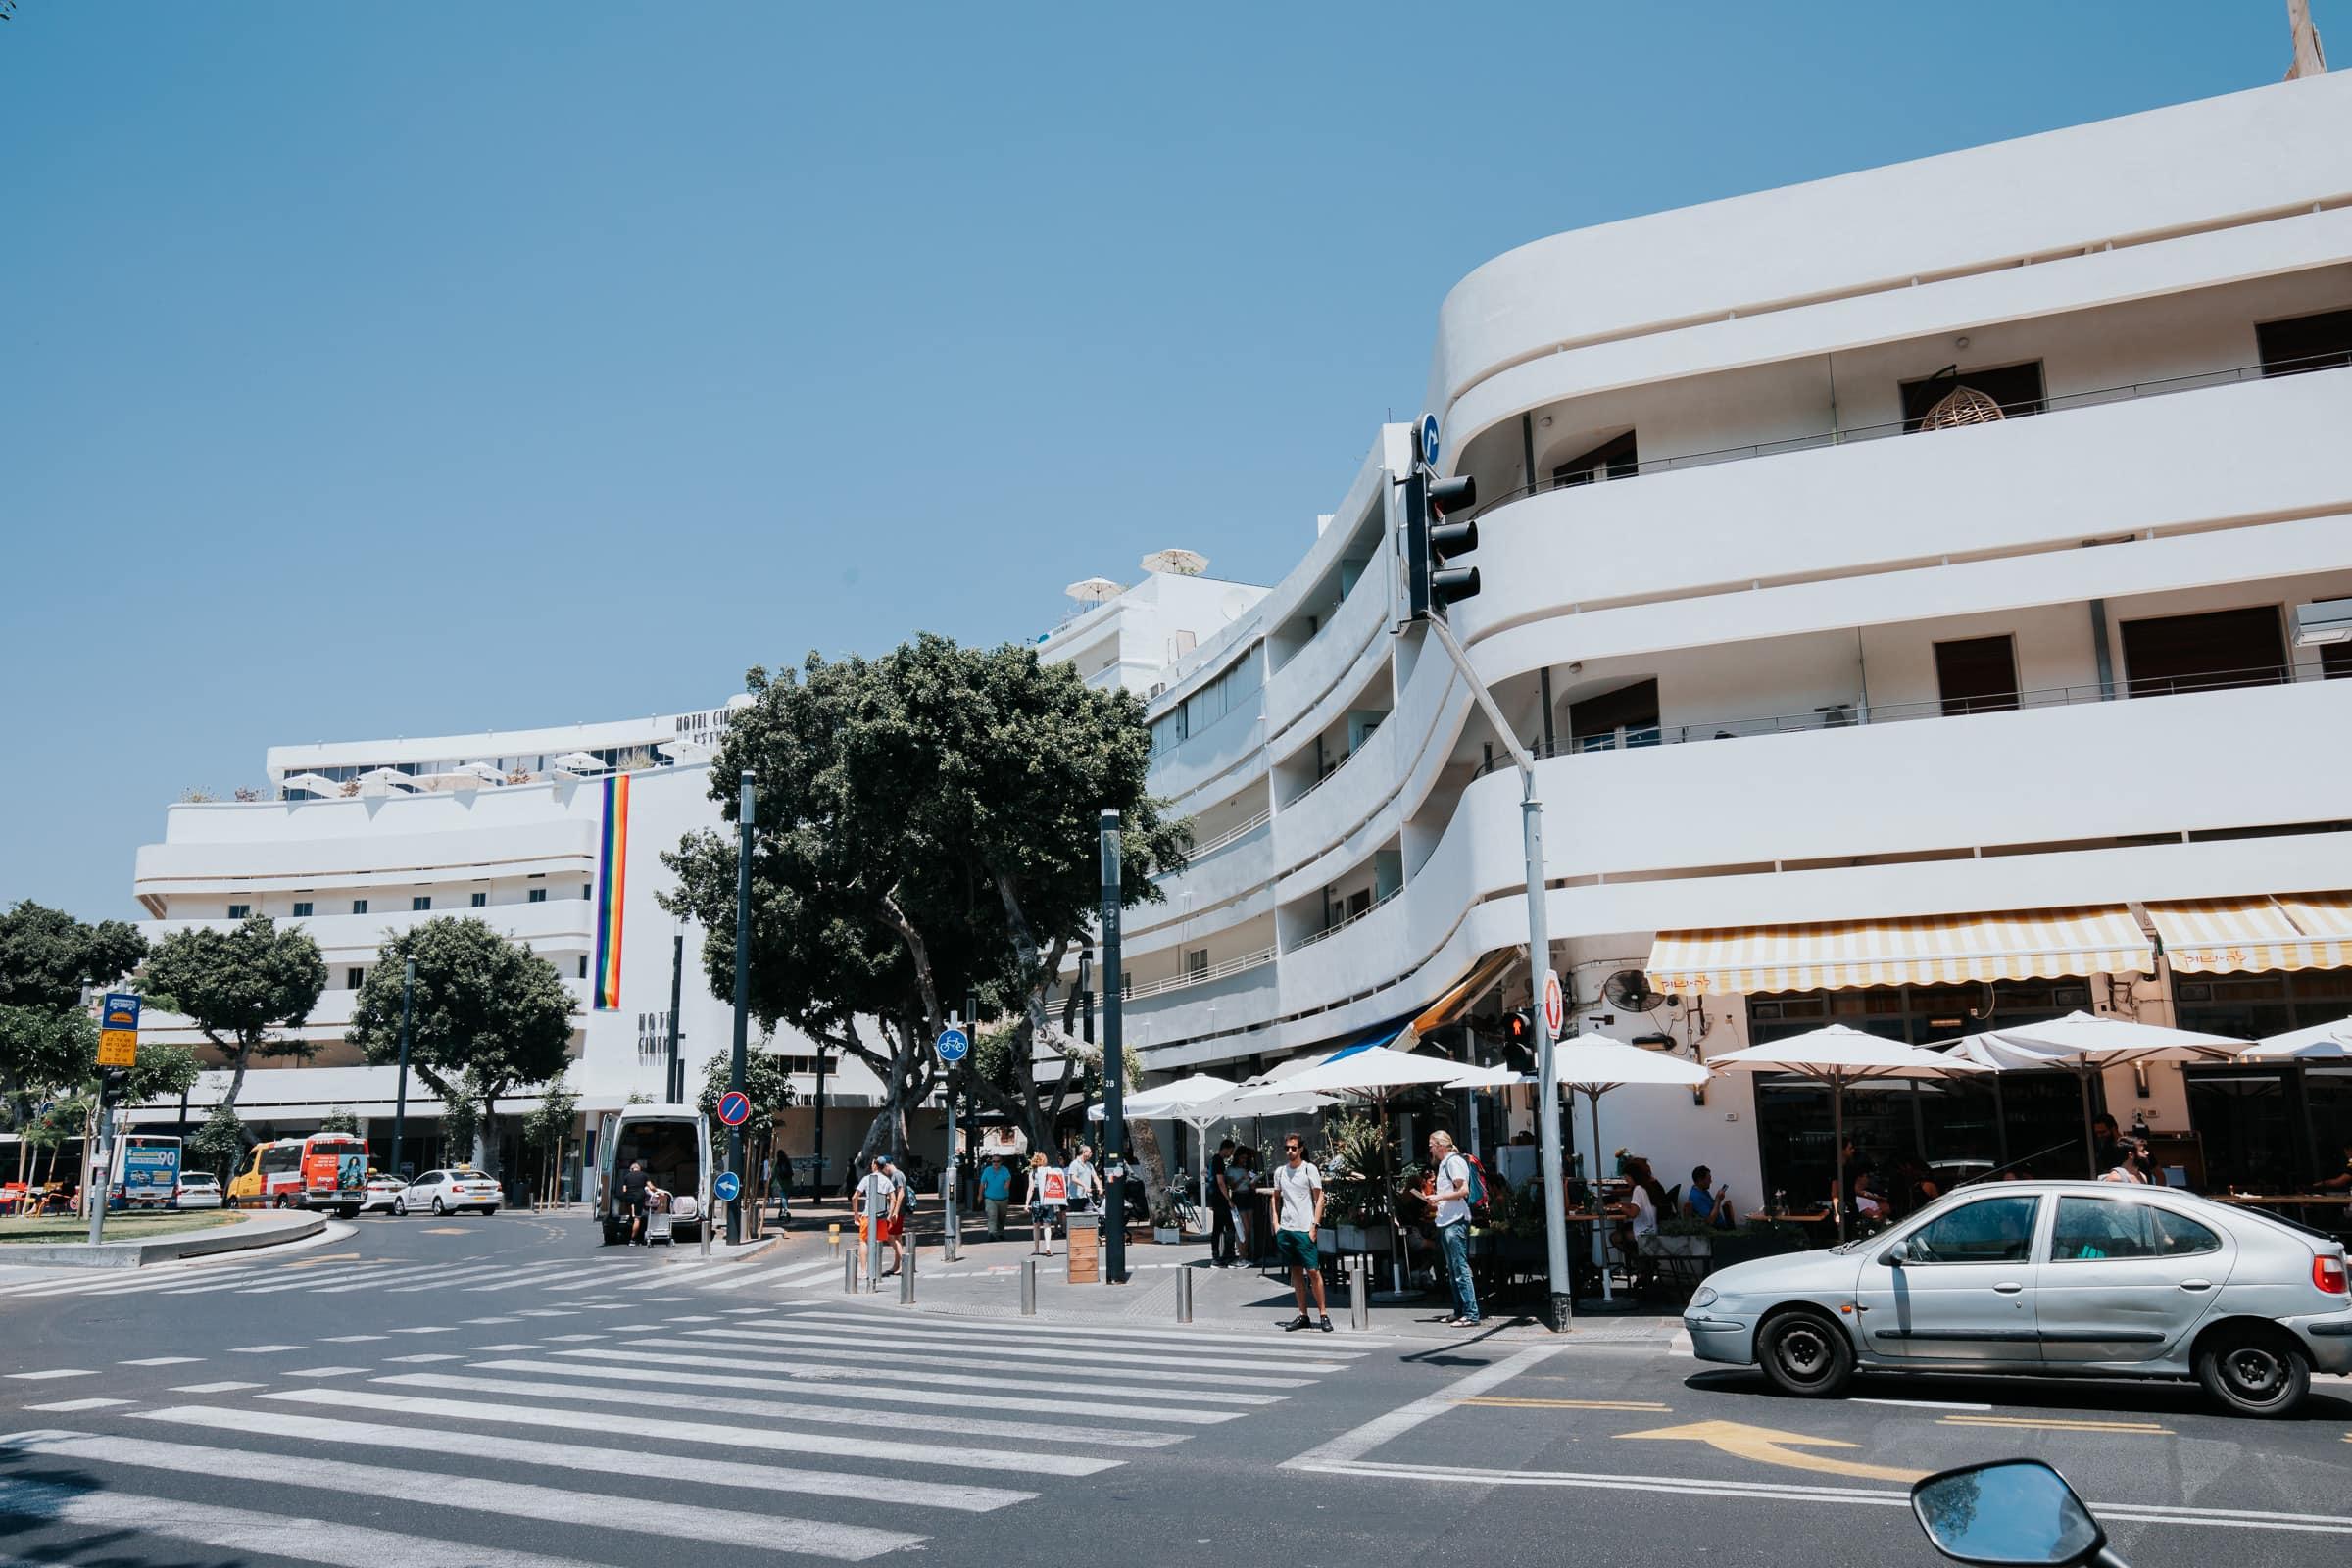 Tel Aviv Sehenswürdigkeiten Dizengoff Square Bauhaus